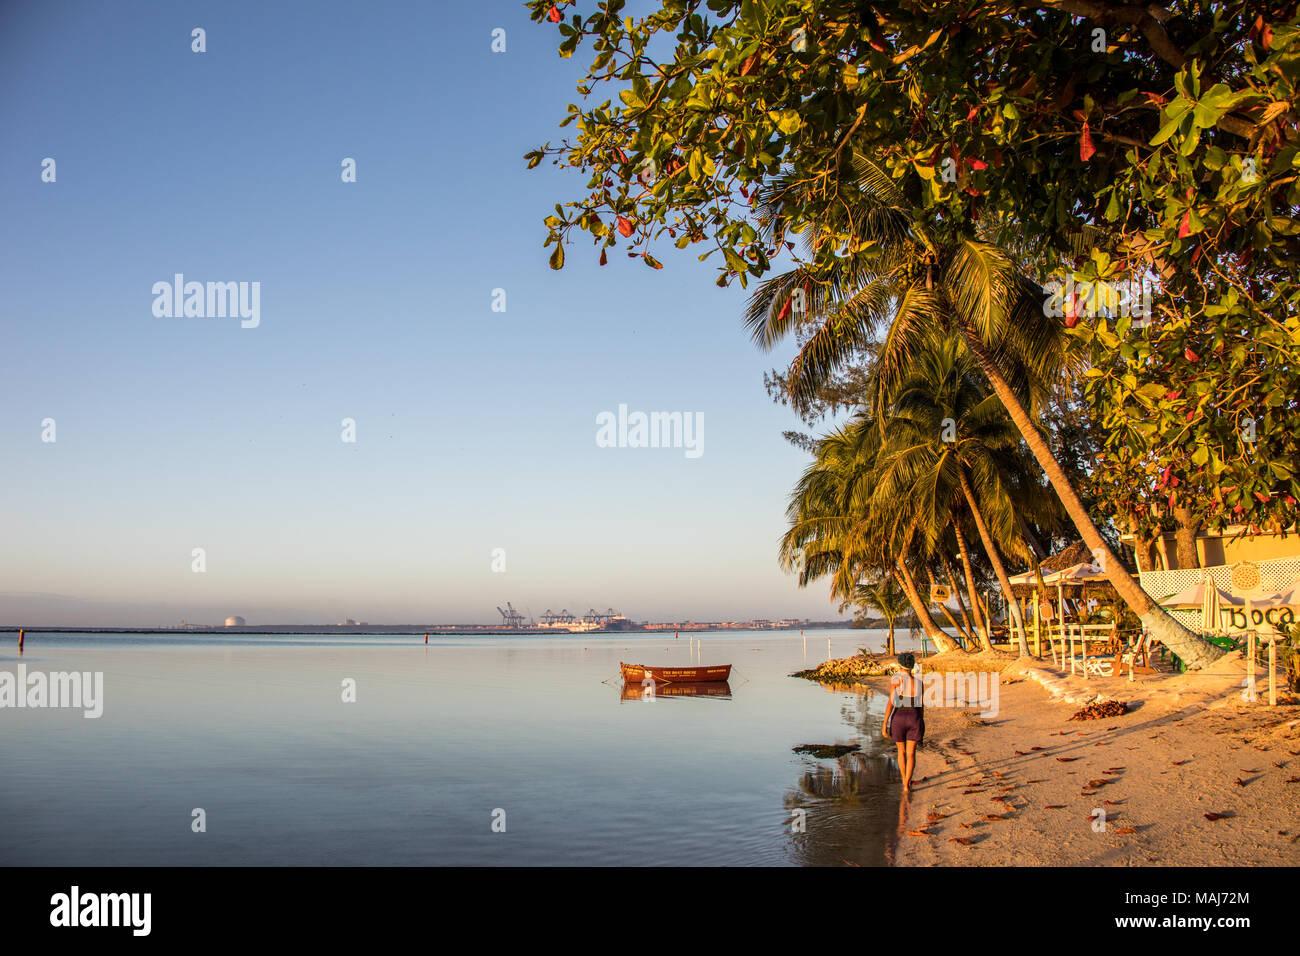 Playa Pública Boca Chica, Boca Cina, Repubblica Domnican Immagini Stock